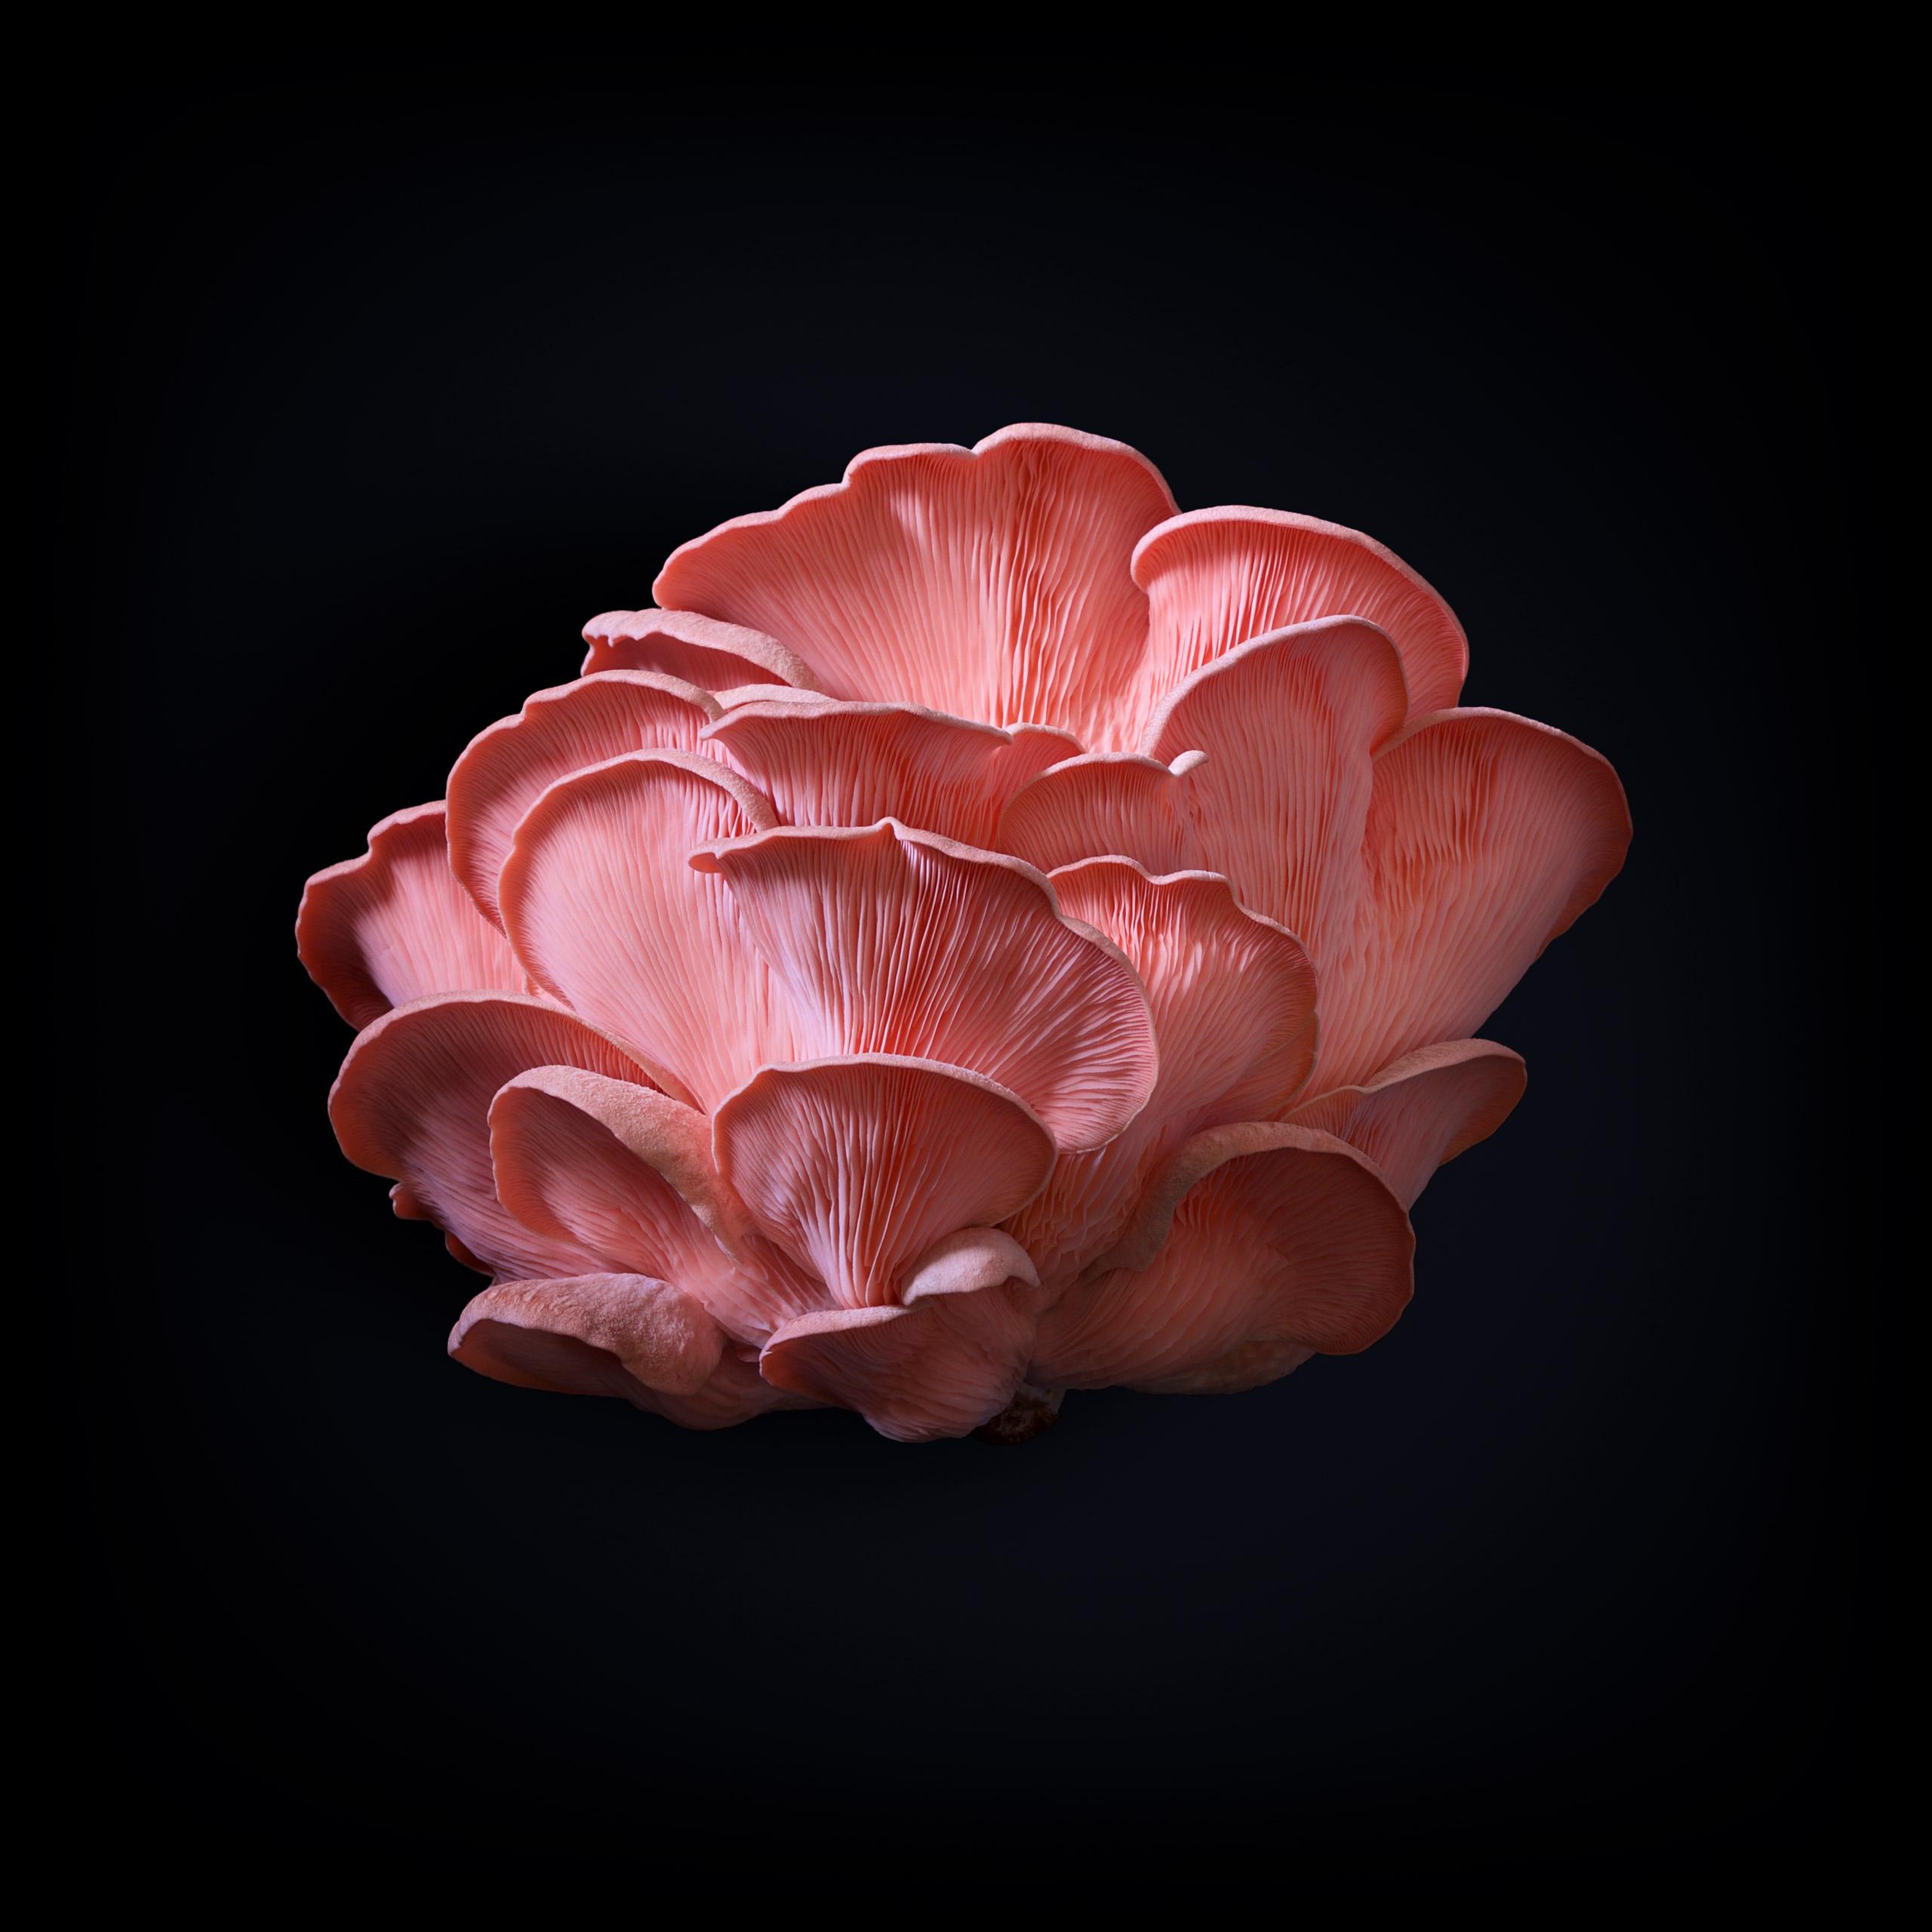 benton-rise-farm-mushroom-01